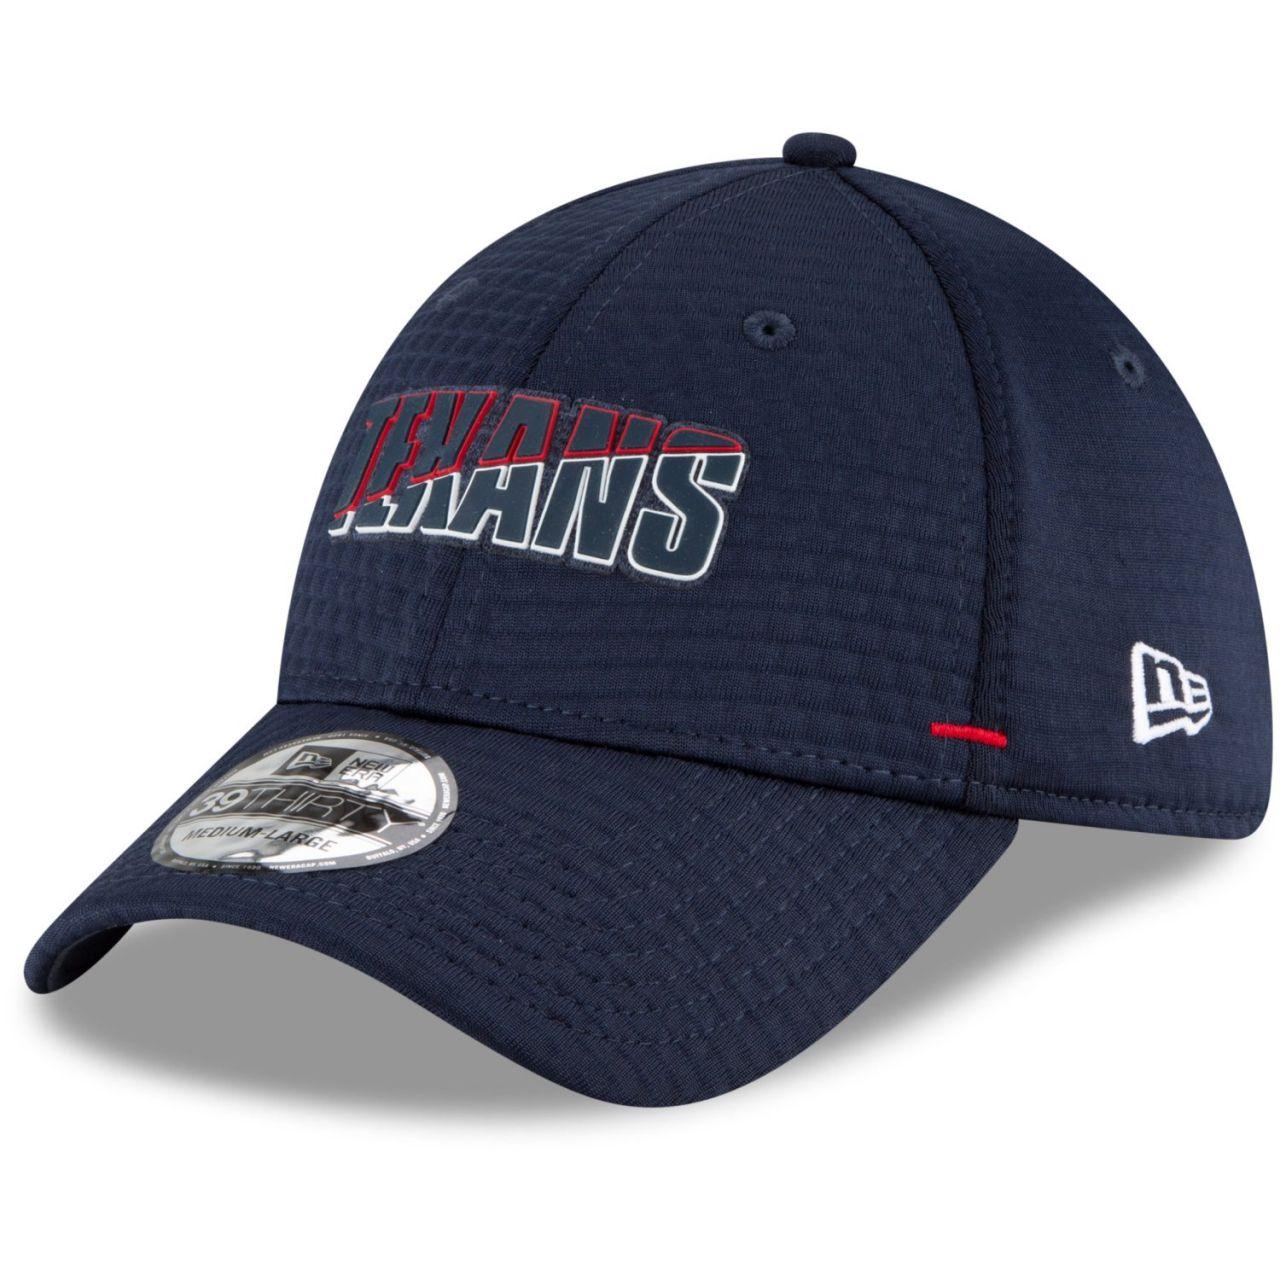 amfoo - New Era 39Thirty Cap - NFL Training Camp Houston Texans